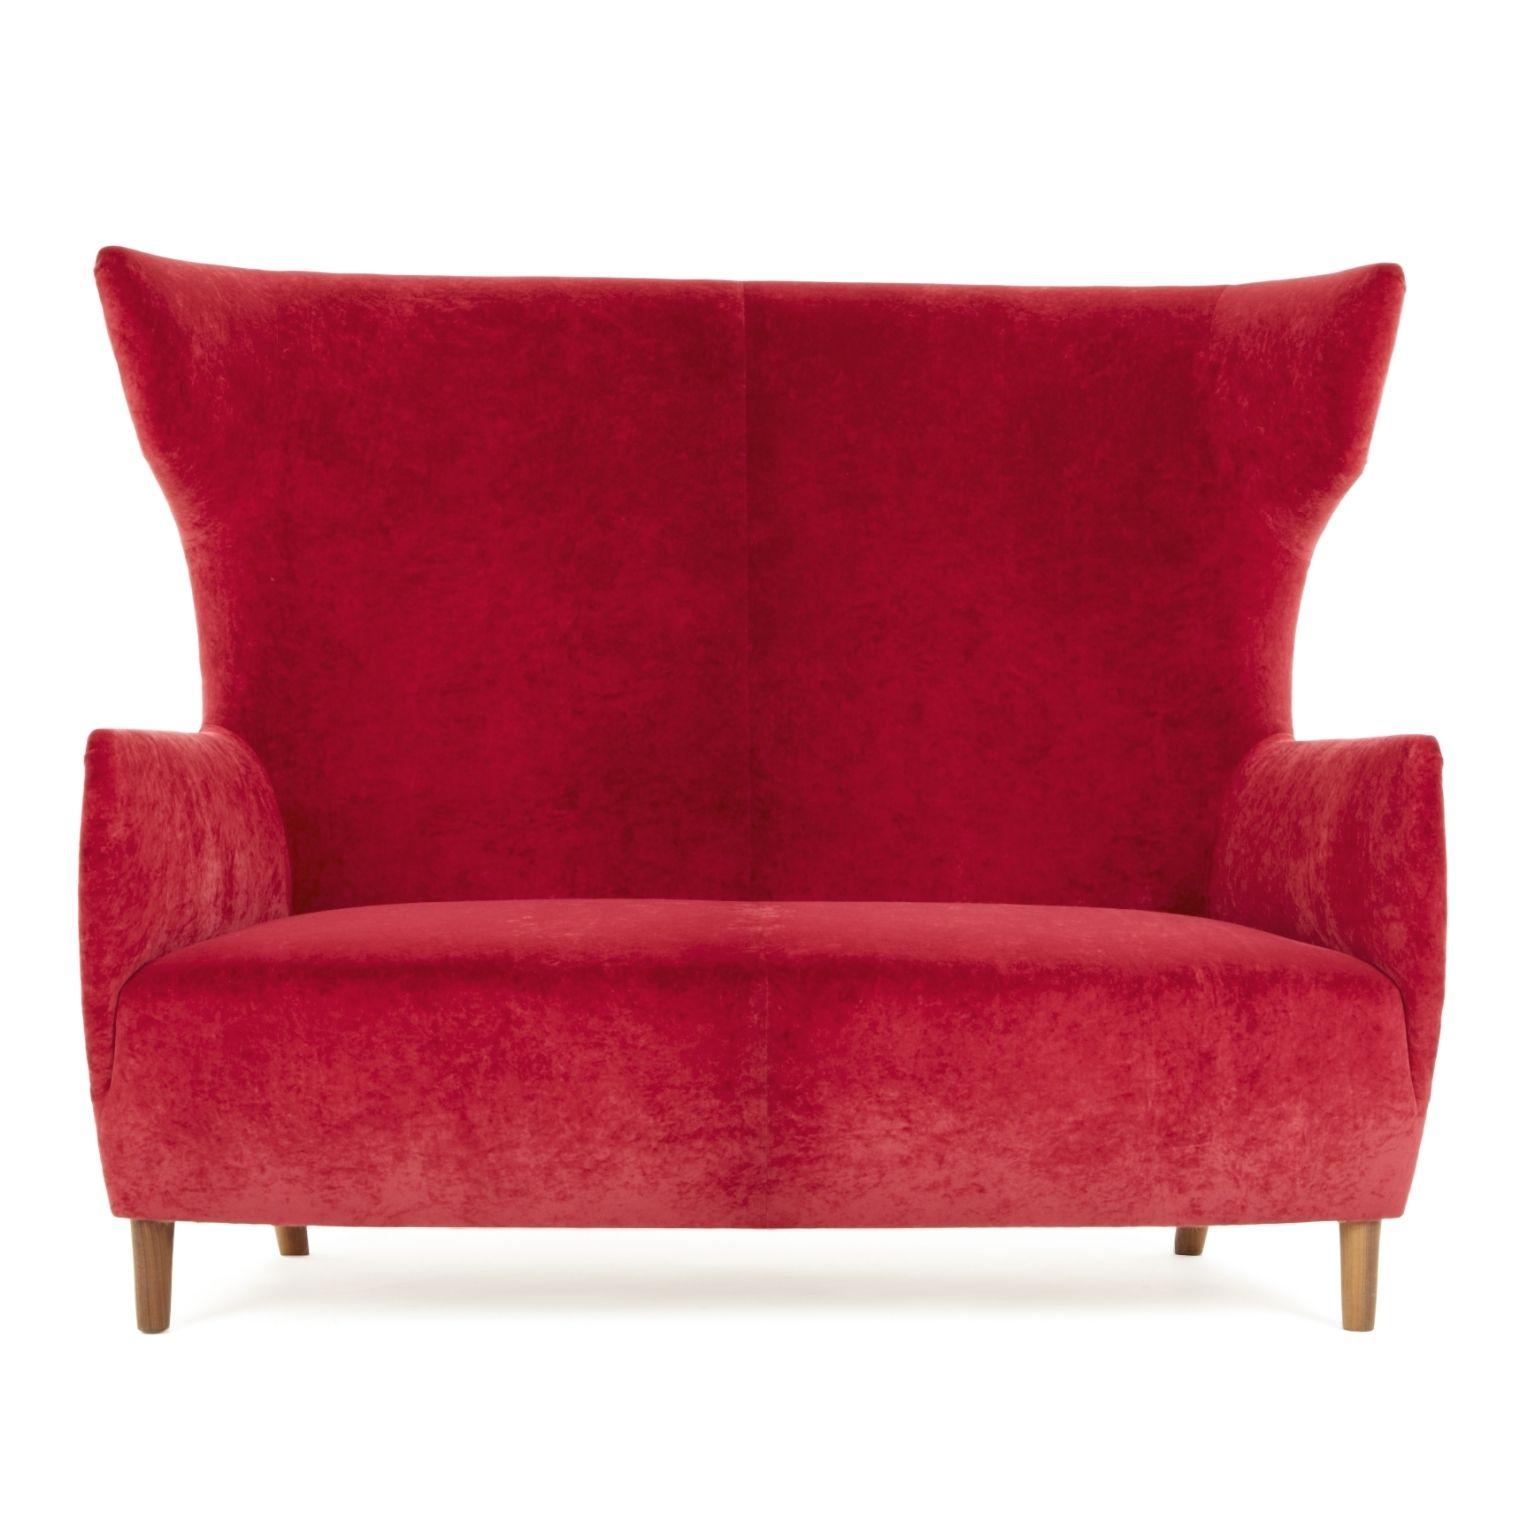 er sofa mit hoher r ckenlehne hardy sofa dare studio. Black Bedroom Furniture Sets. Home Design Ideas